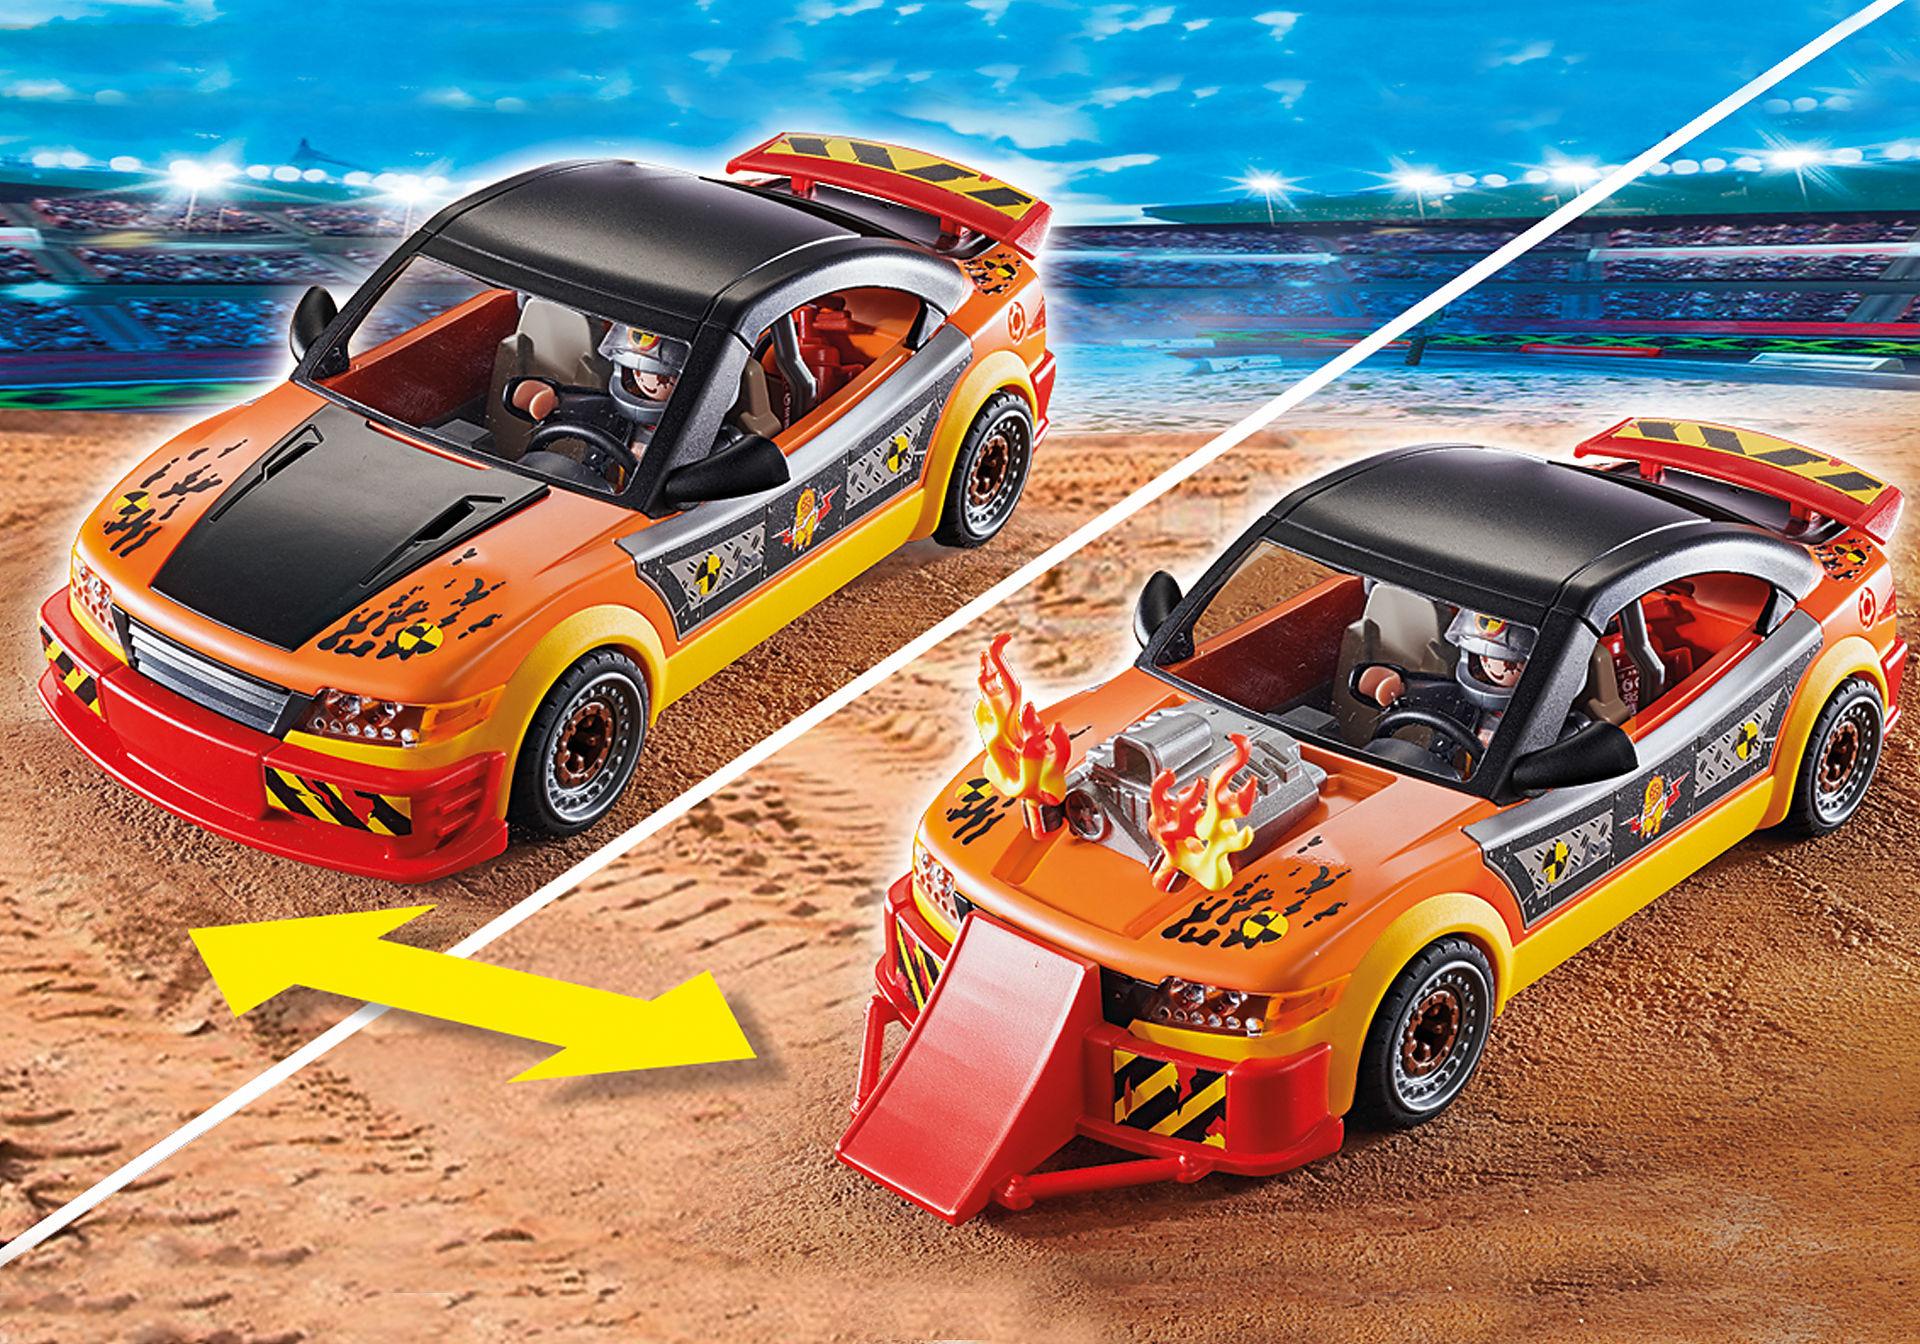 70551 Stuntshow Crashcar zoom image5